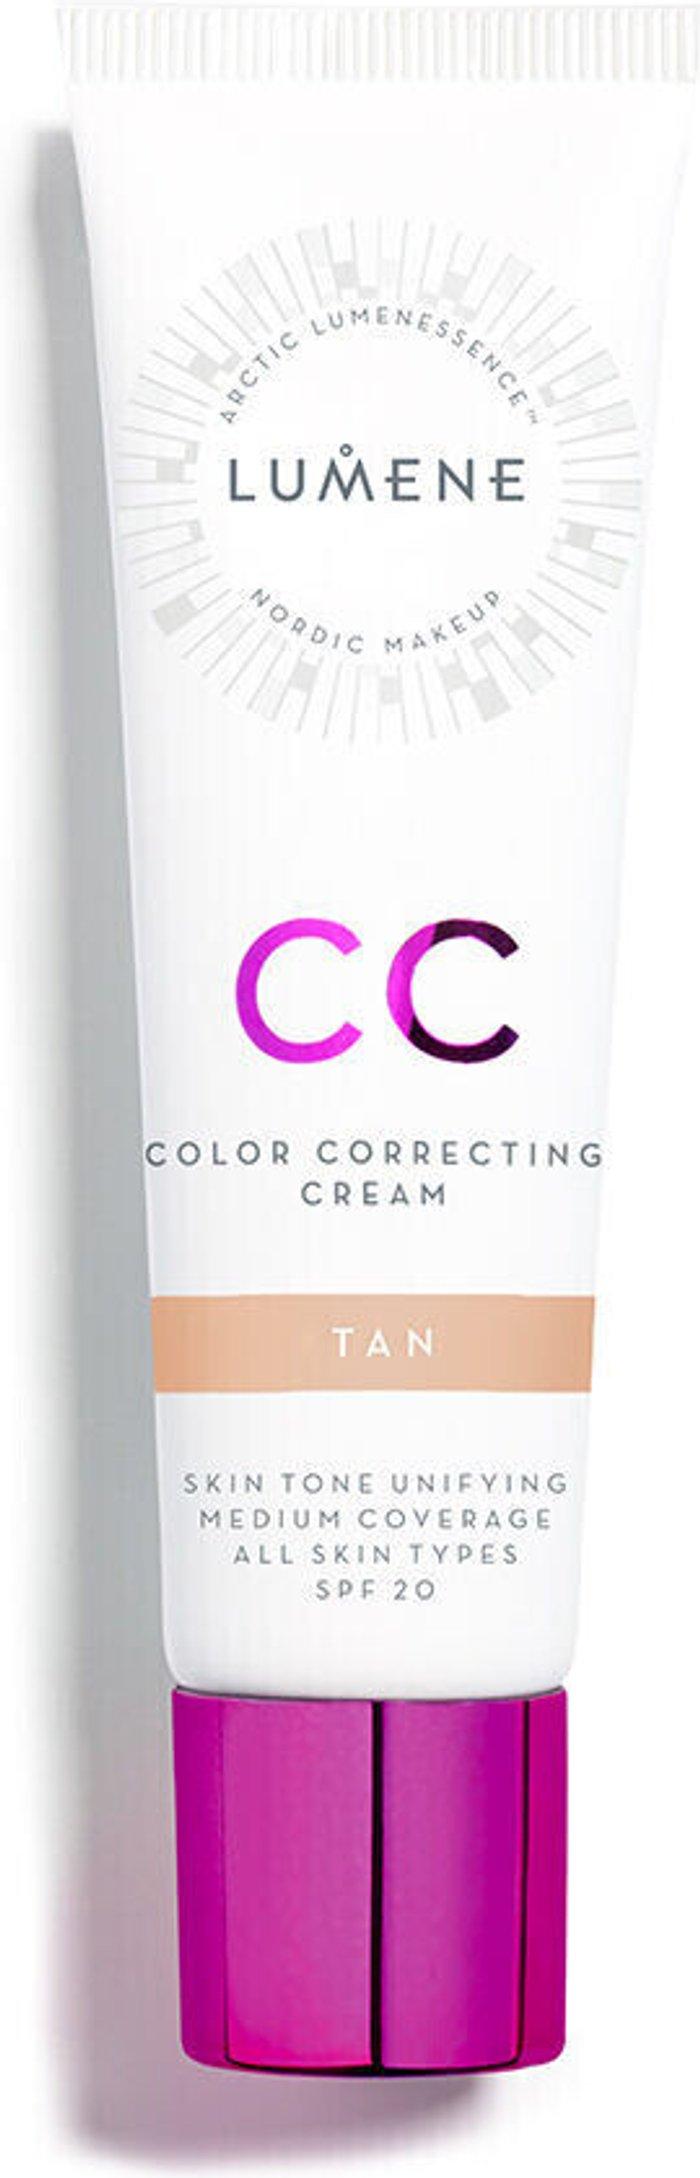 Lumene Beauty Lumene CC Color Correcting Cream SPF 20 (30ml)